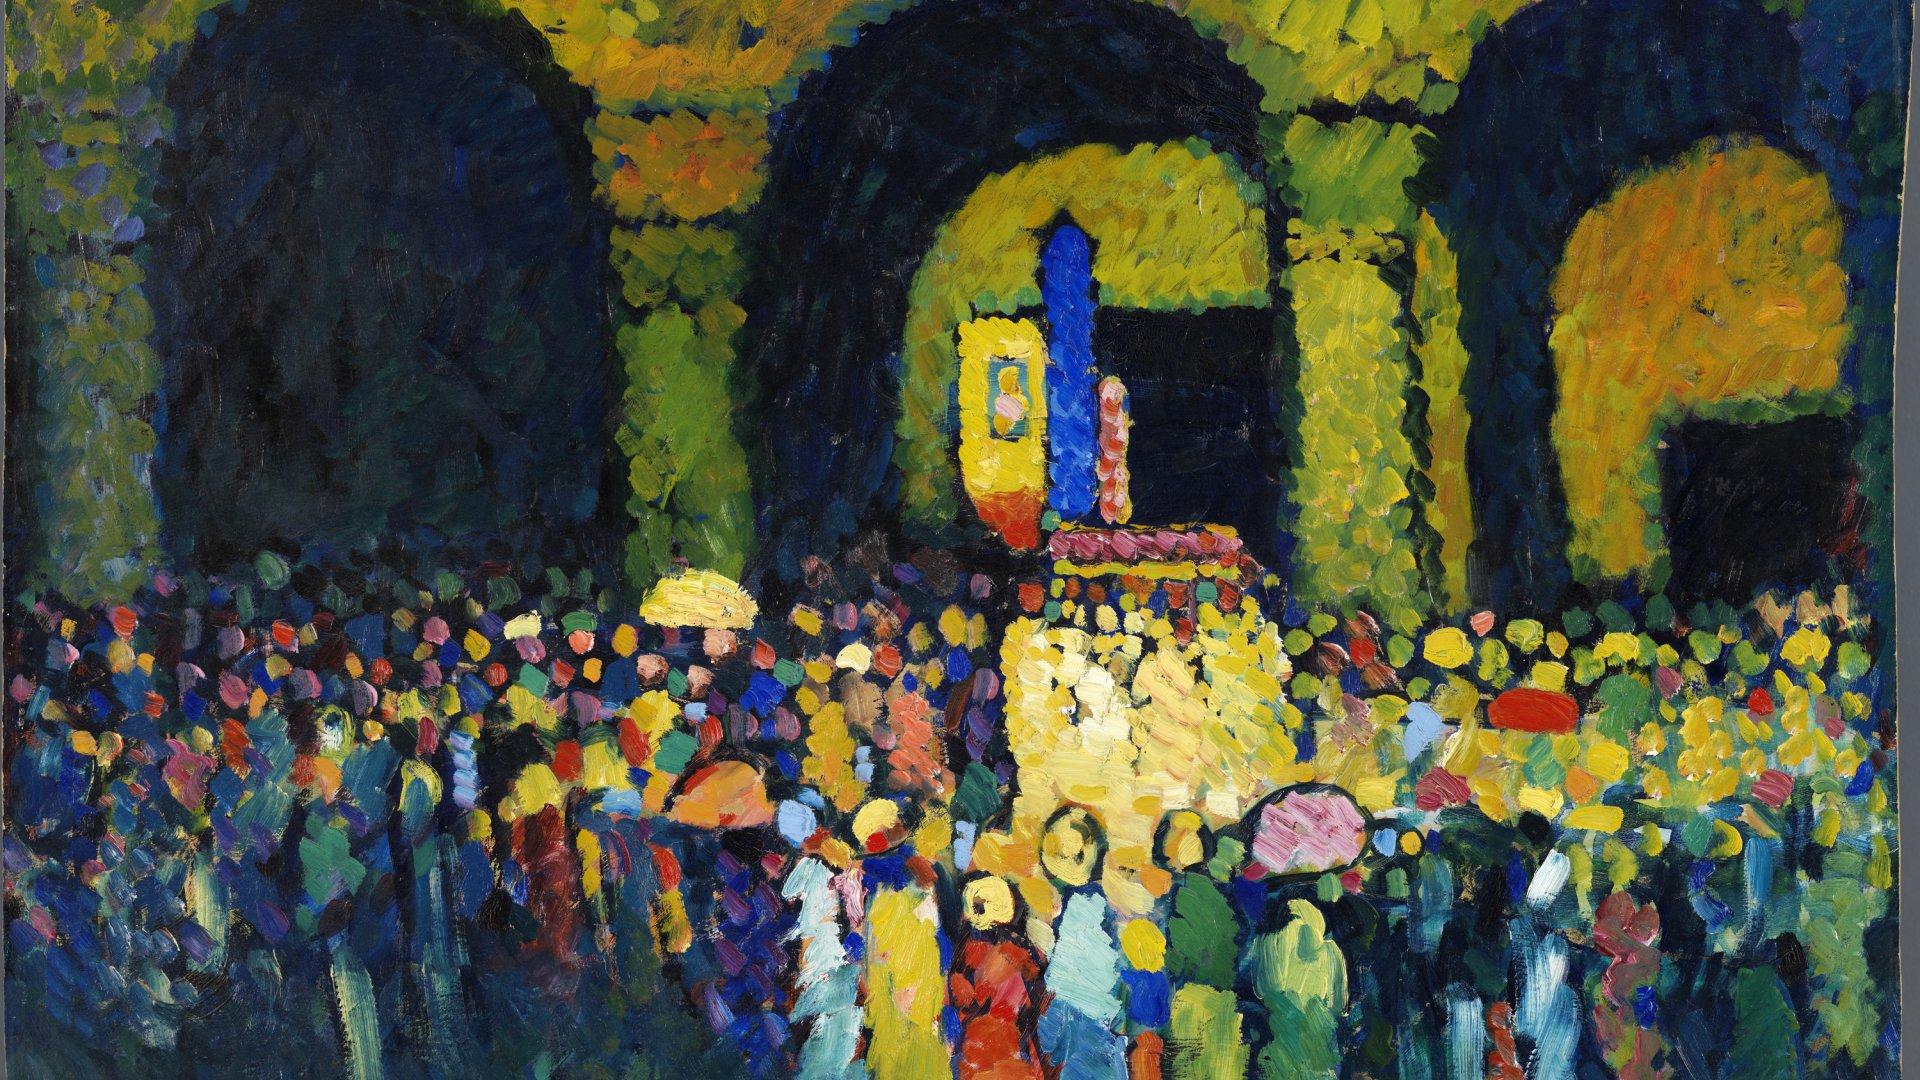 Wassily Kandinsky. 'La Ludwigskirche en Múnich', 1908. Colección Carmen Thyssen-Bornemisza. © Wassily Kandinsky, VEGAP, Madrid.